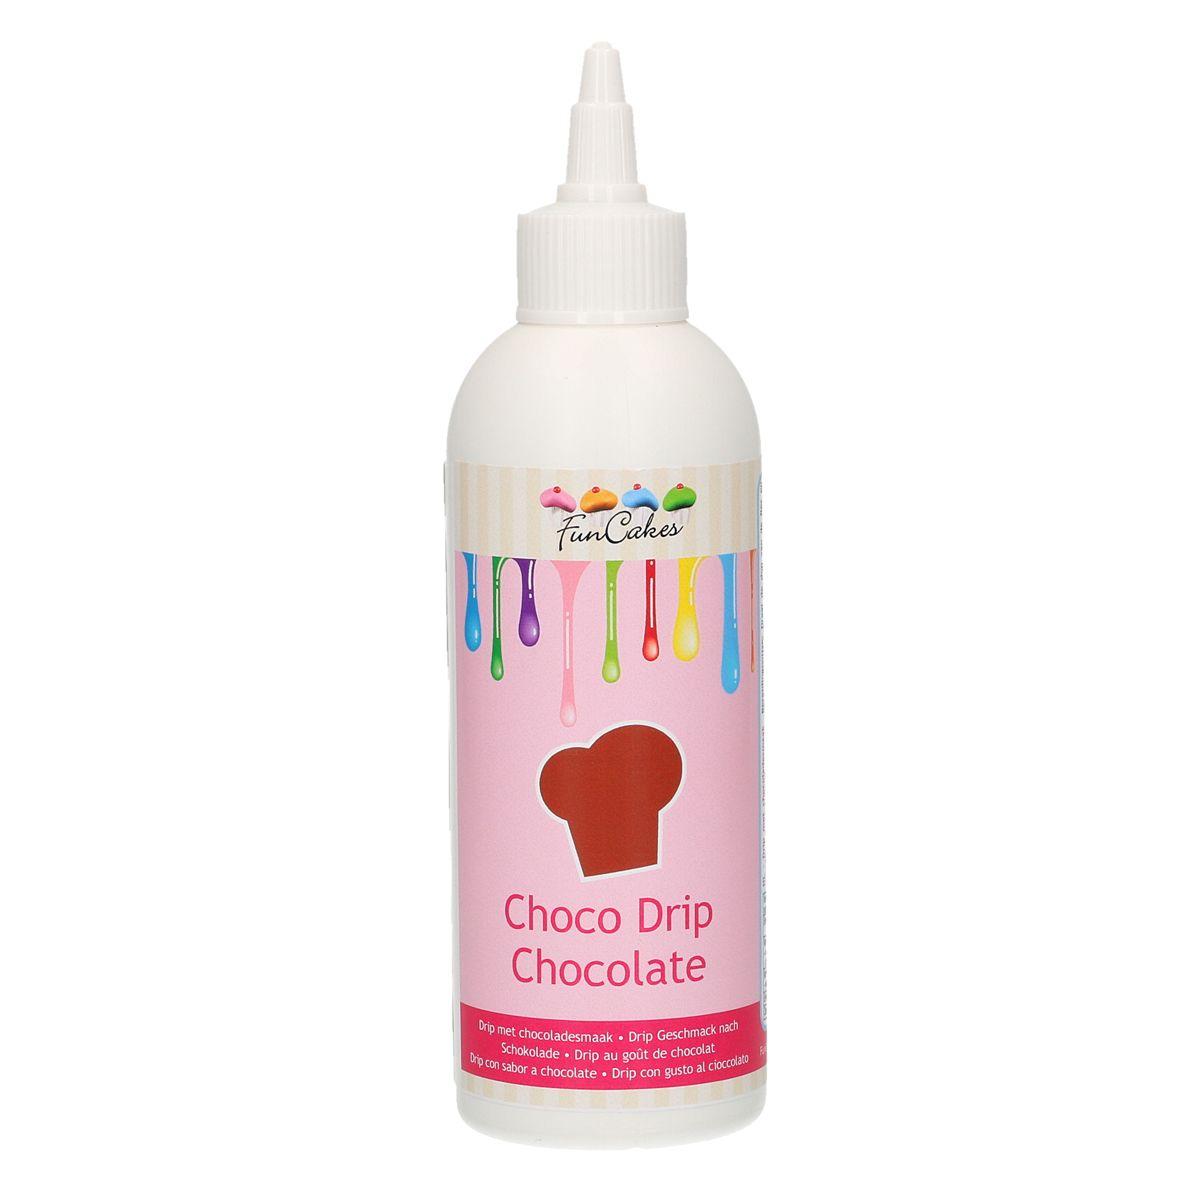 Choco Drip Schokolade in der Tube 180g